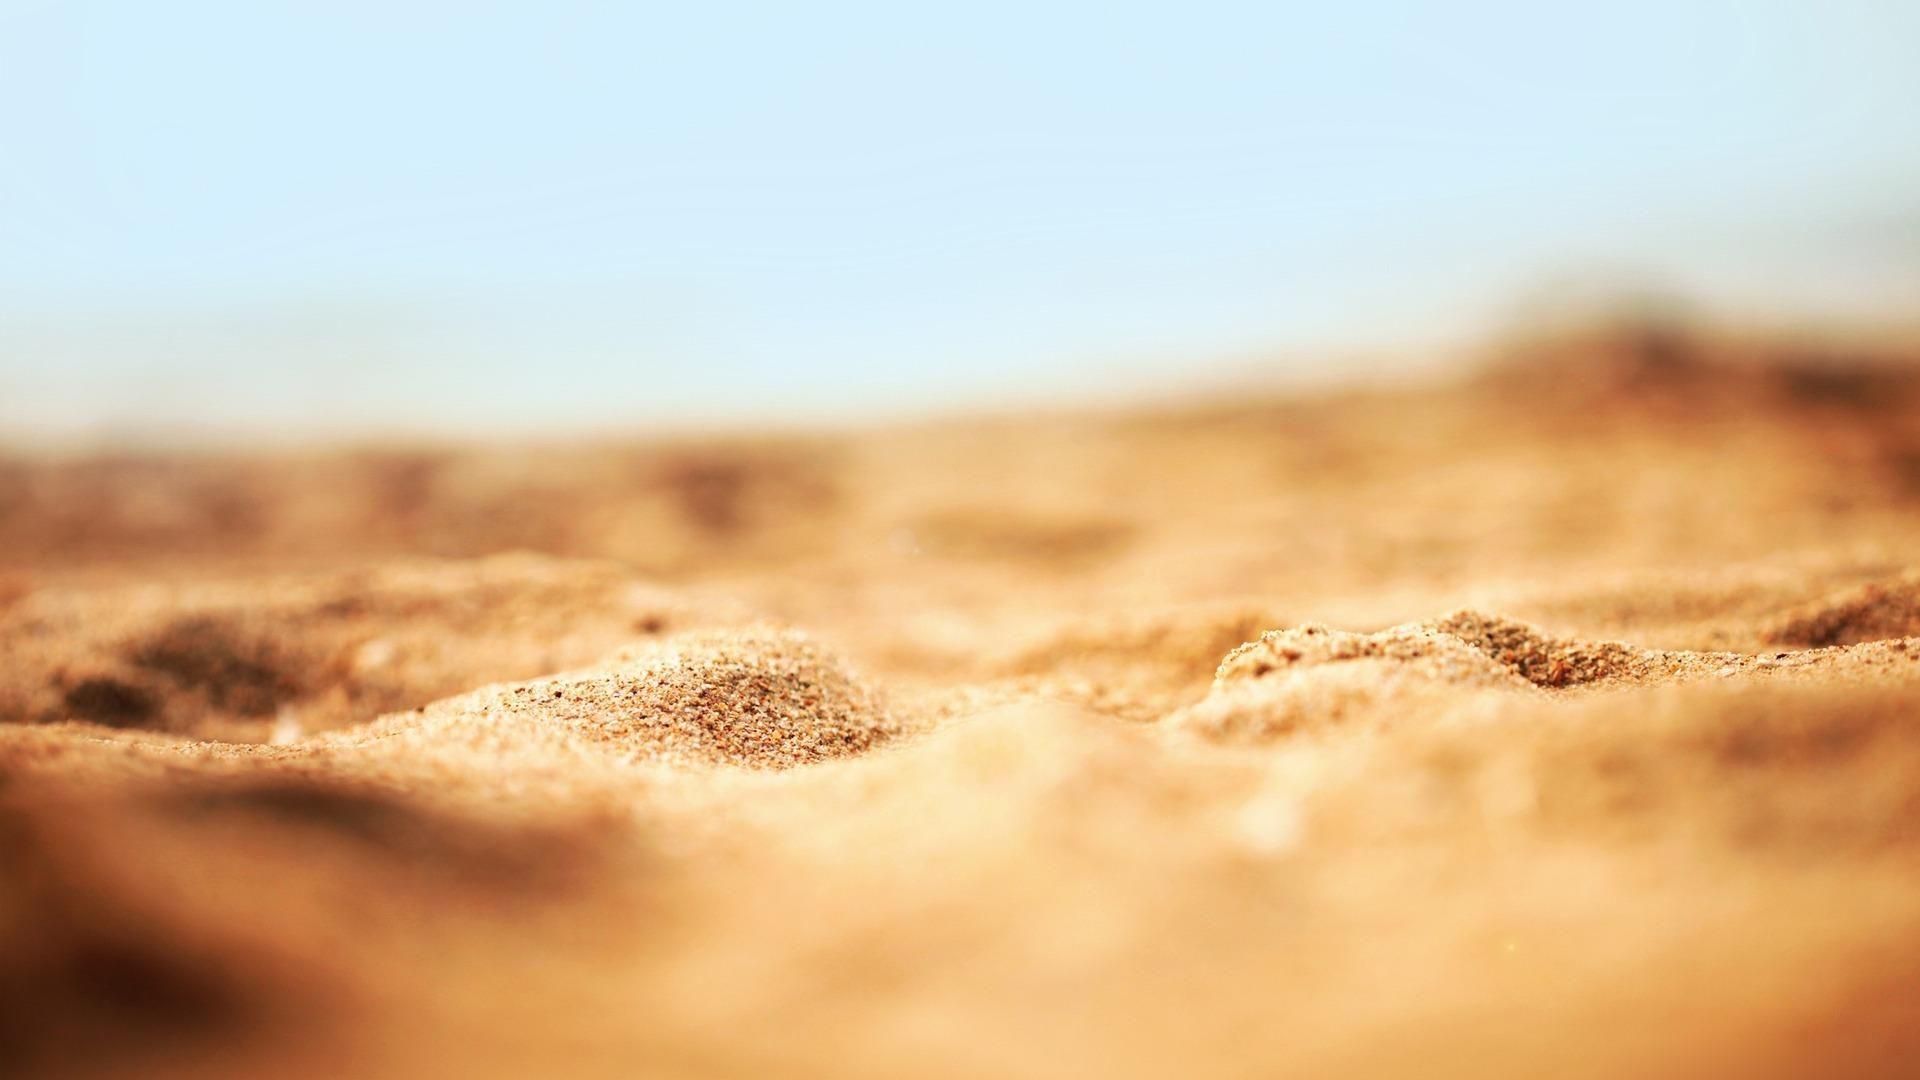 Desert Sand Footage